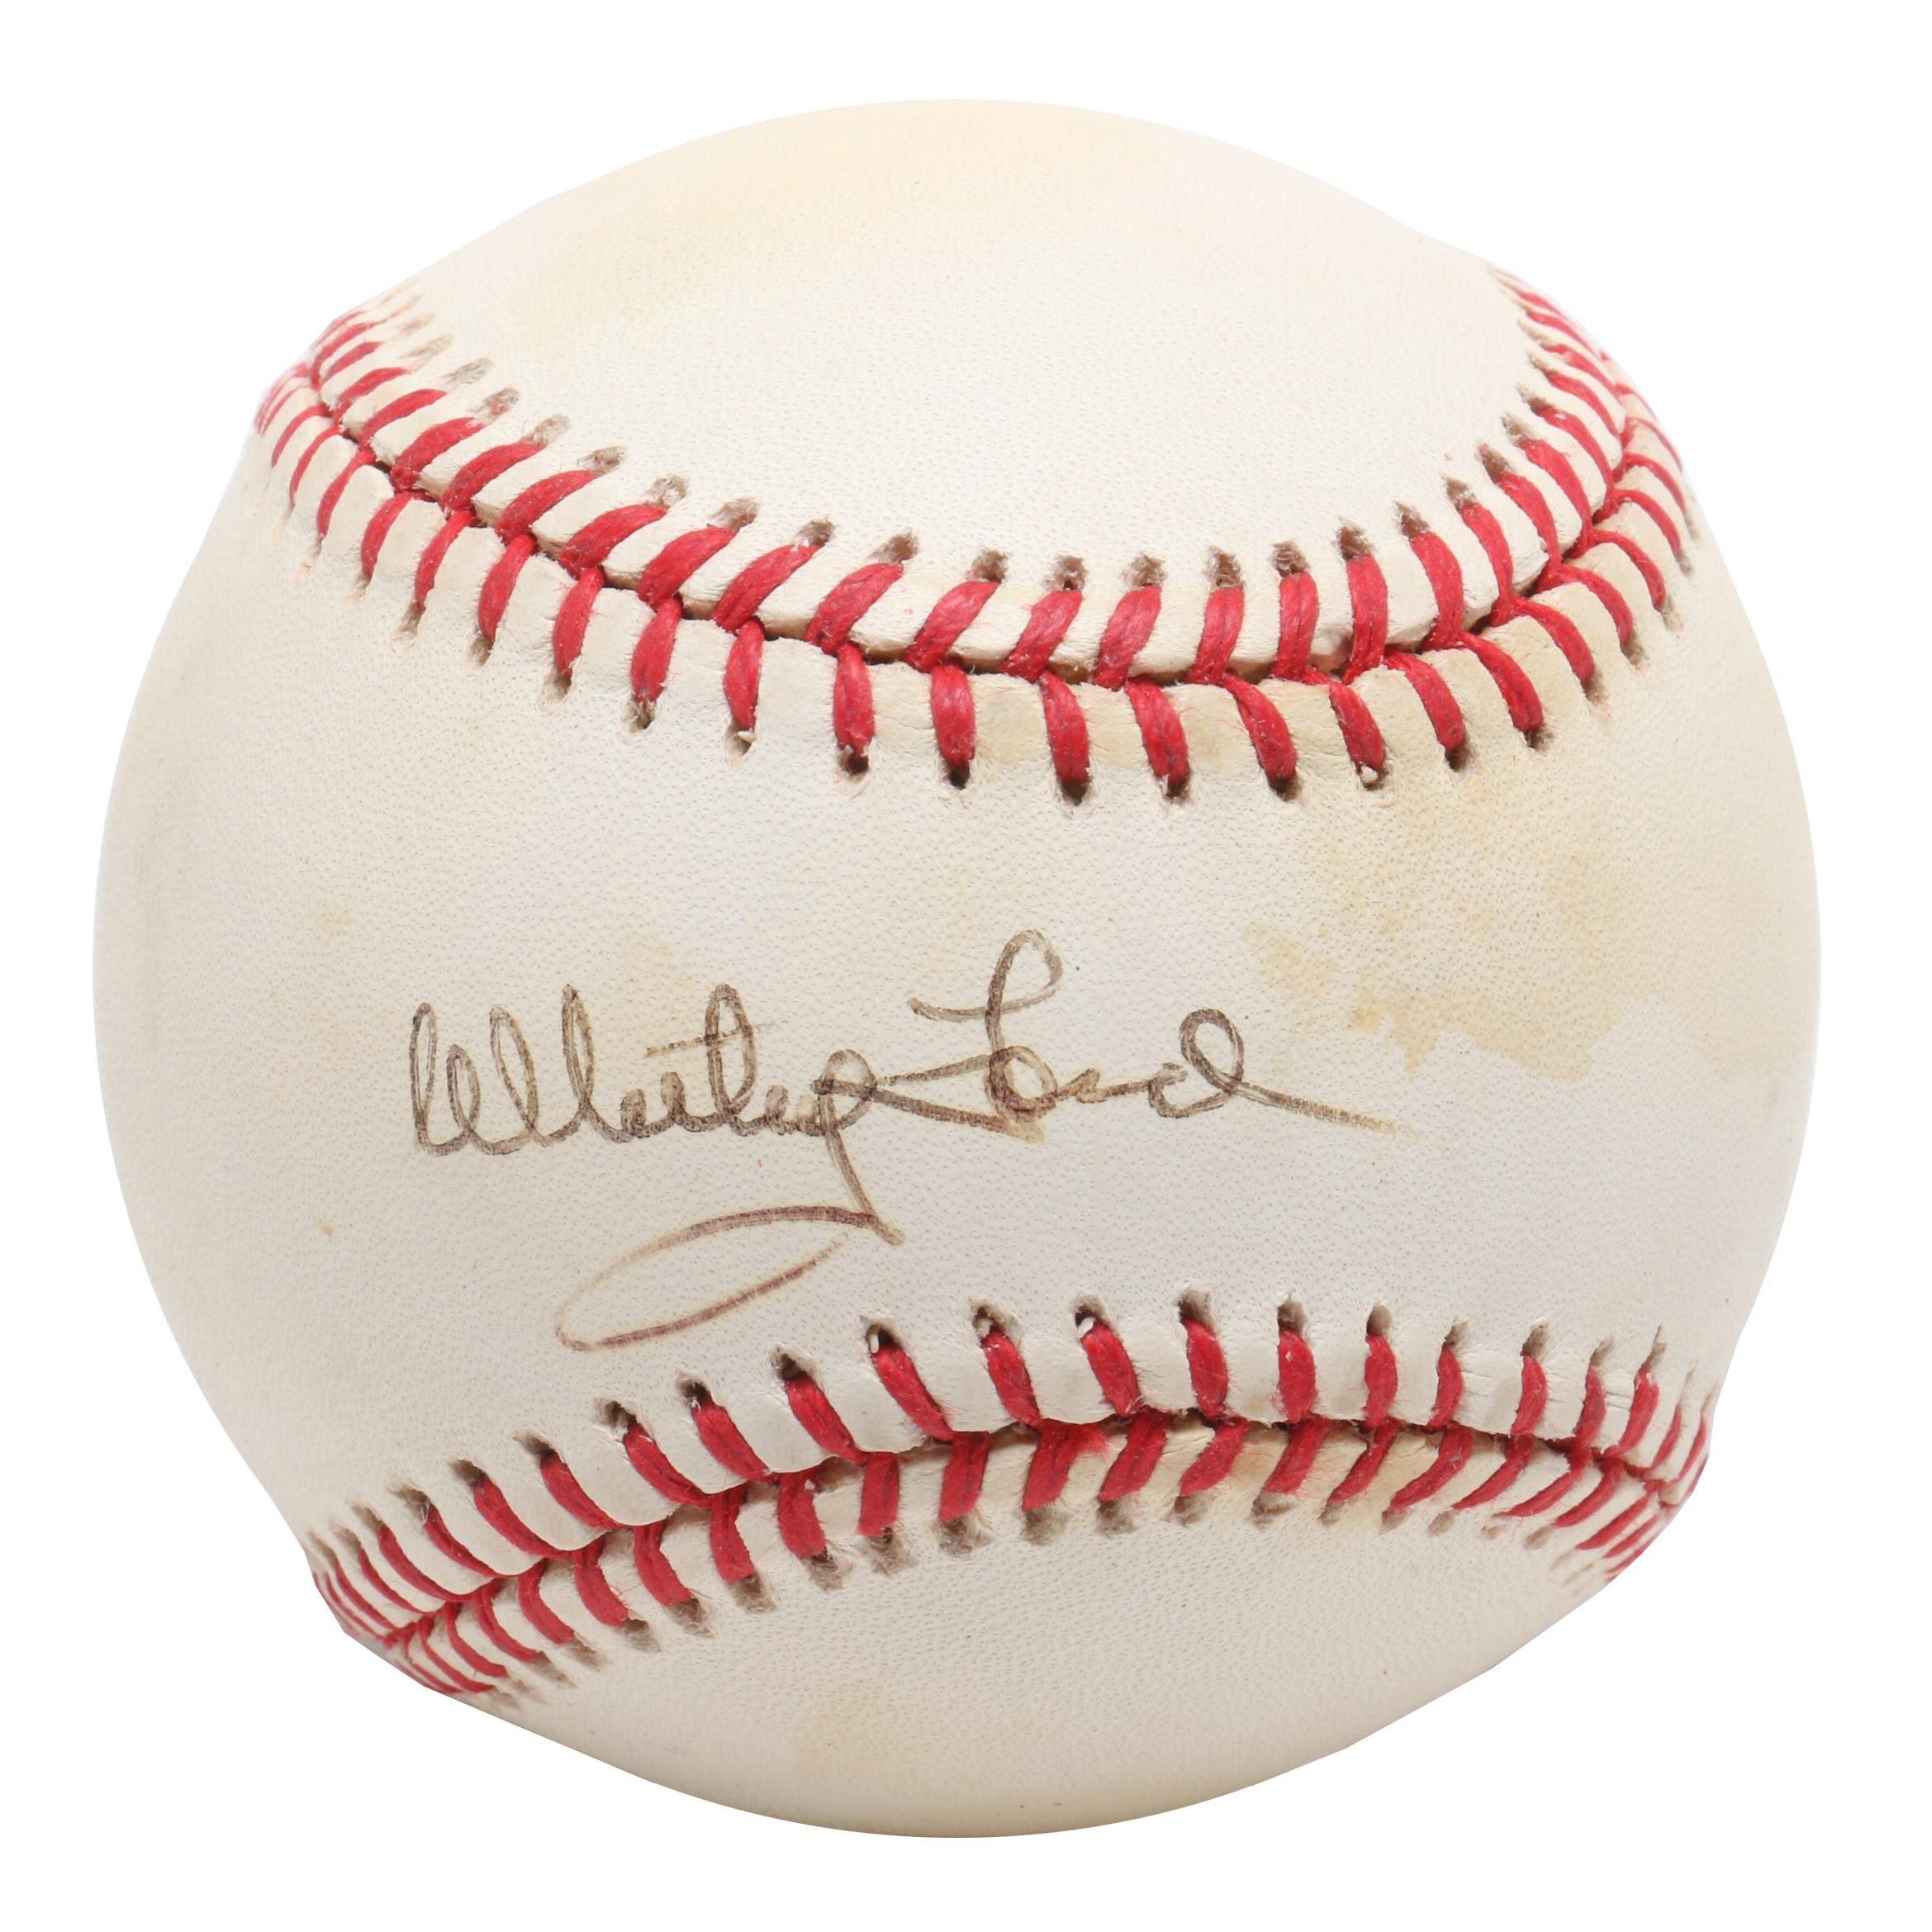 (HOF) Whitey Ford Signed Rawlings American League Baseball